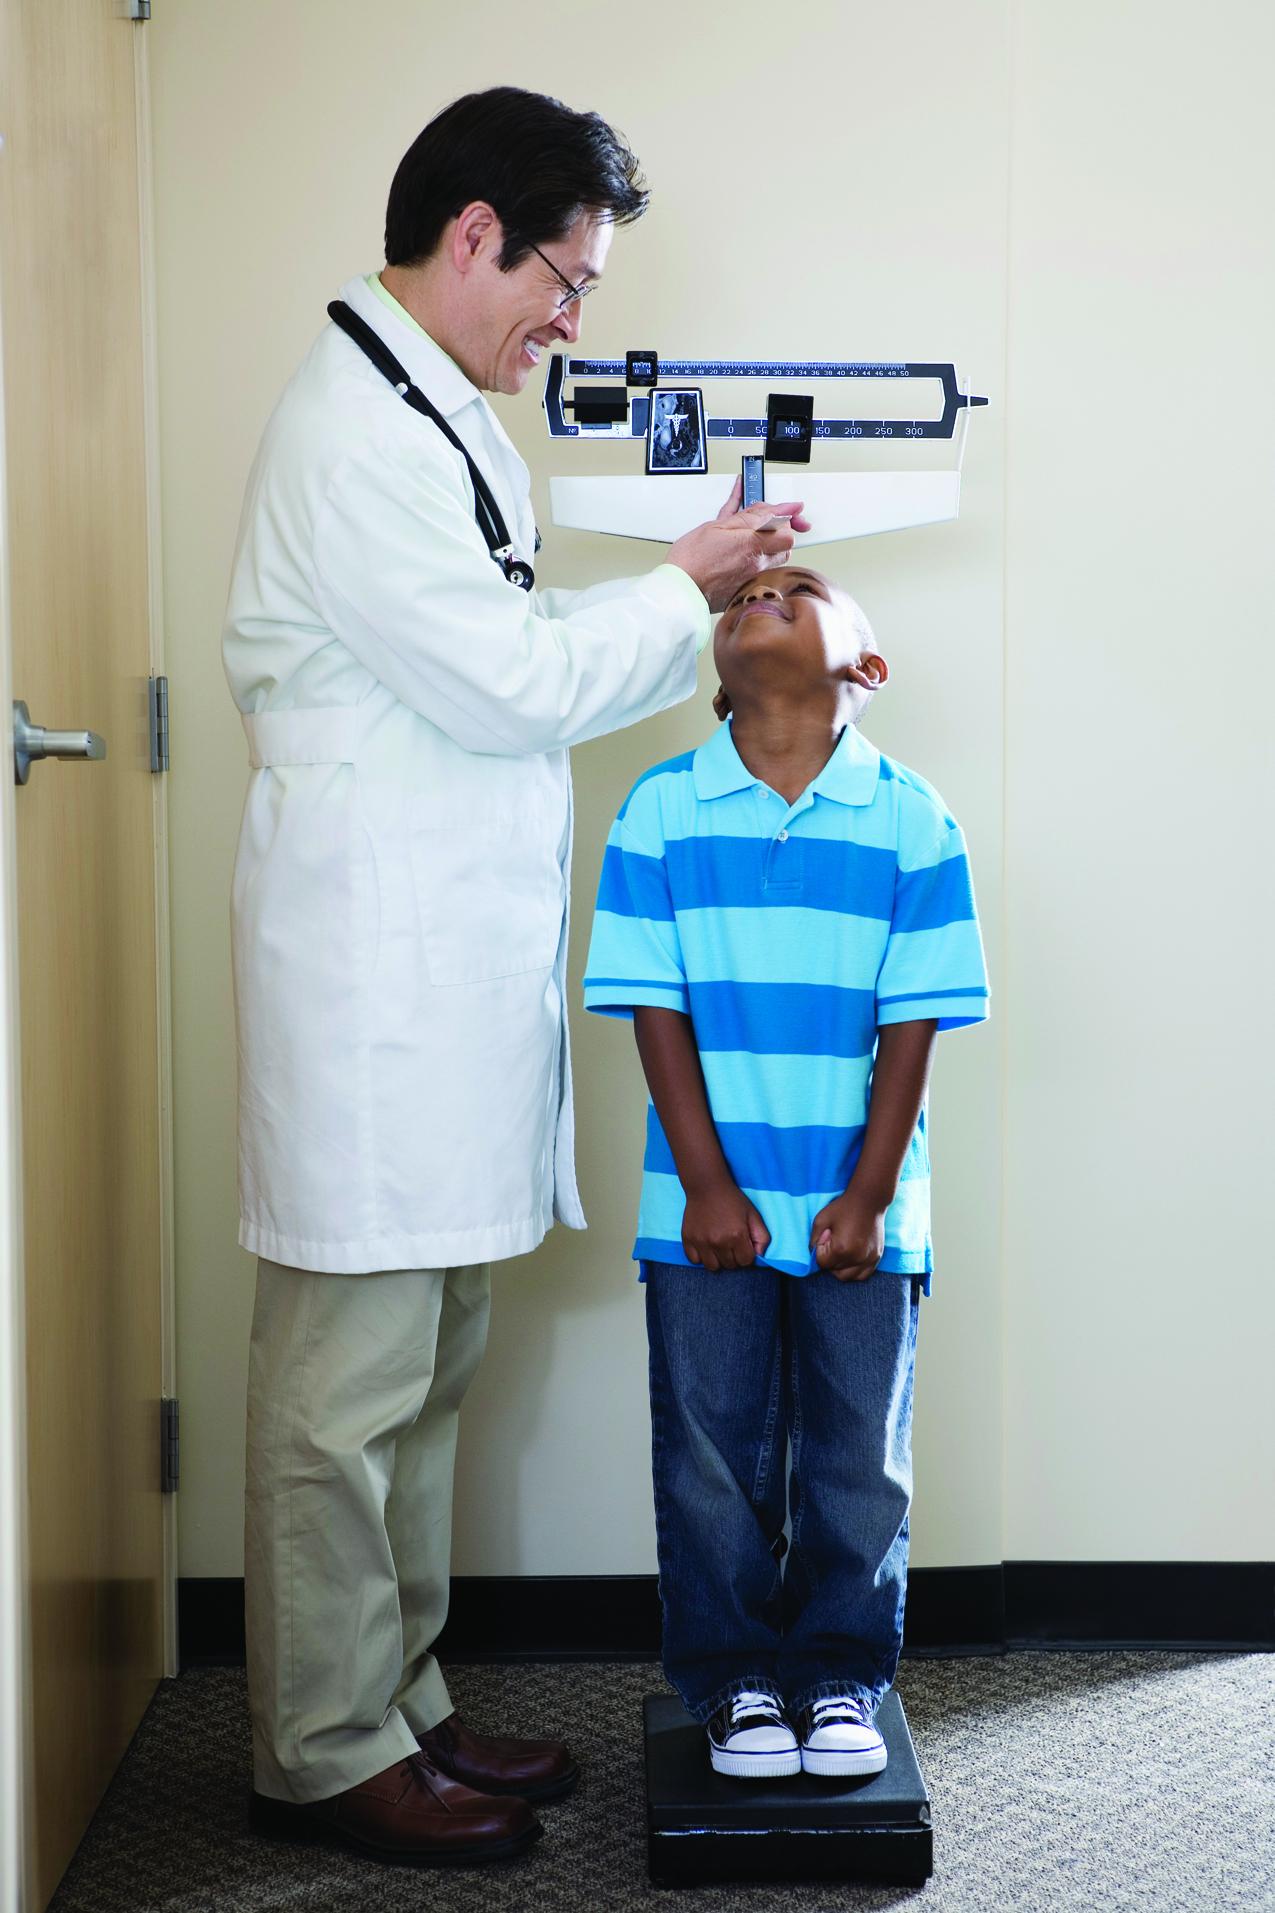 Add health screenings to back-to-school checklist